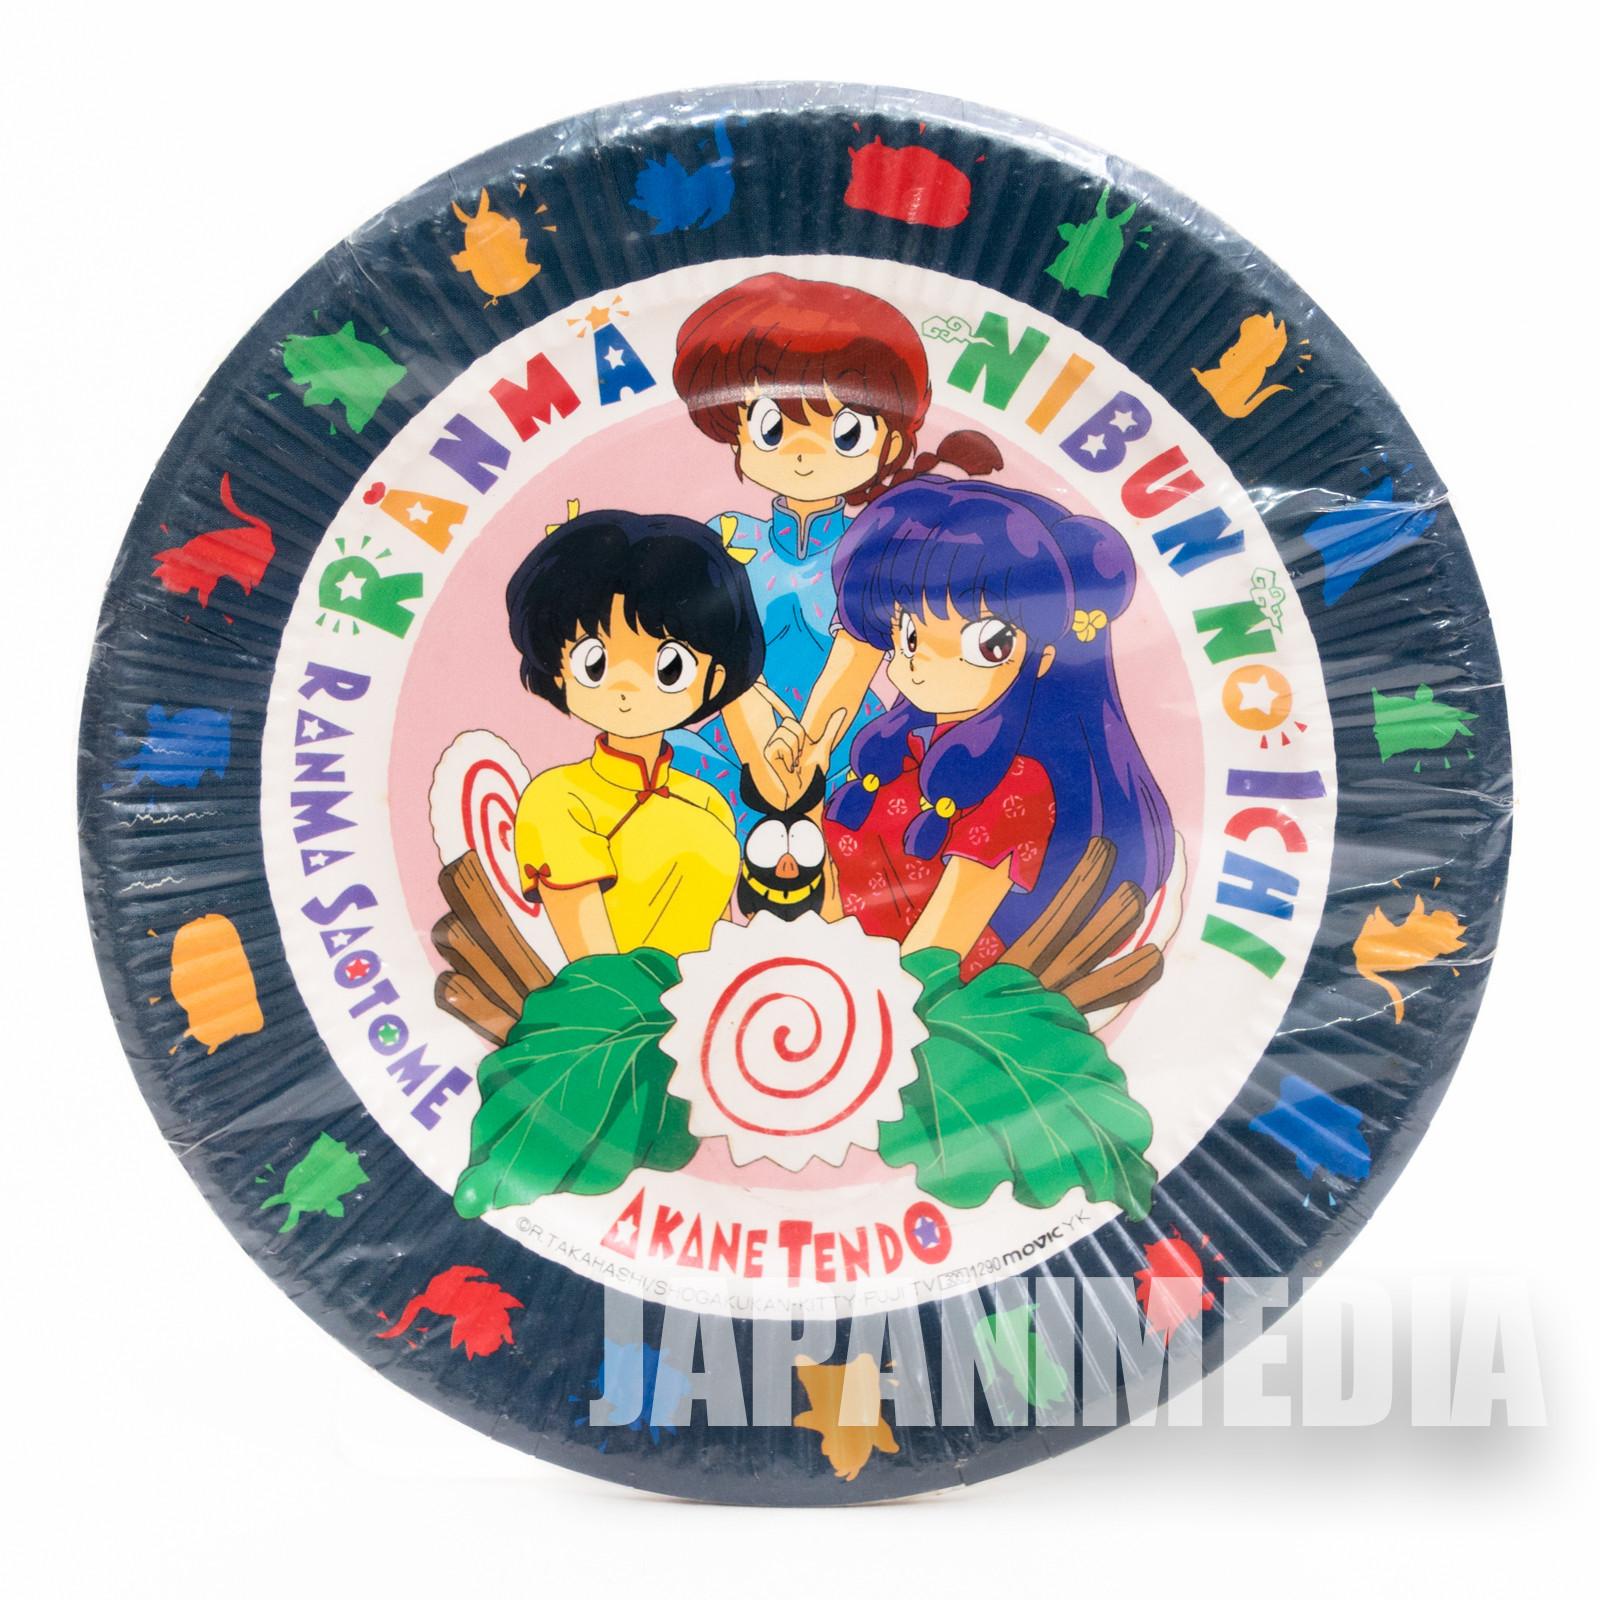 Ranma 1/2 Paper Plate 5pc set Akane Shampoo JAPAN ANIME